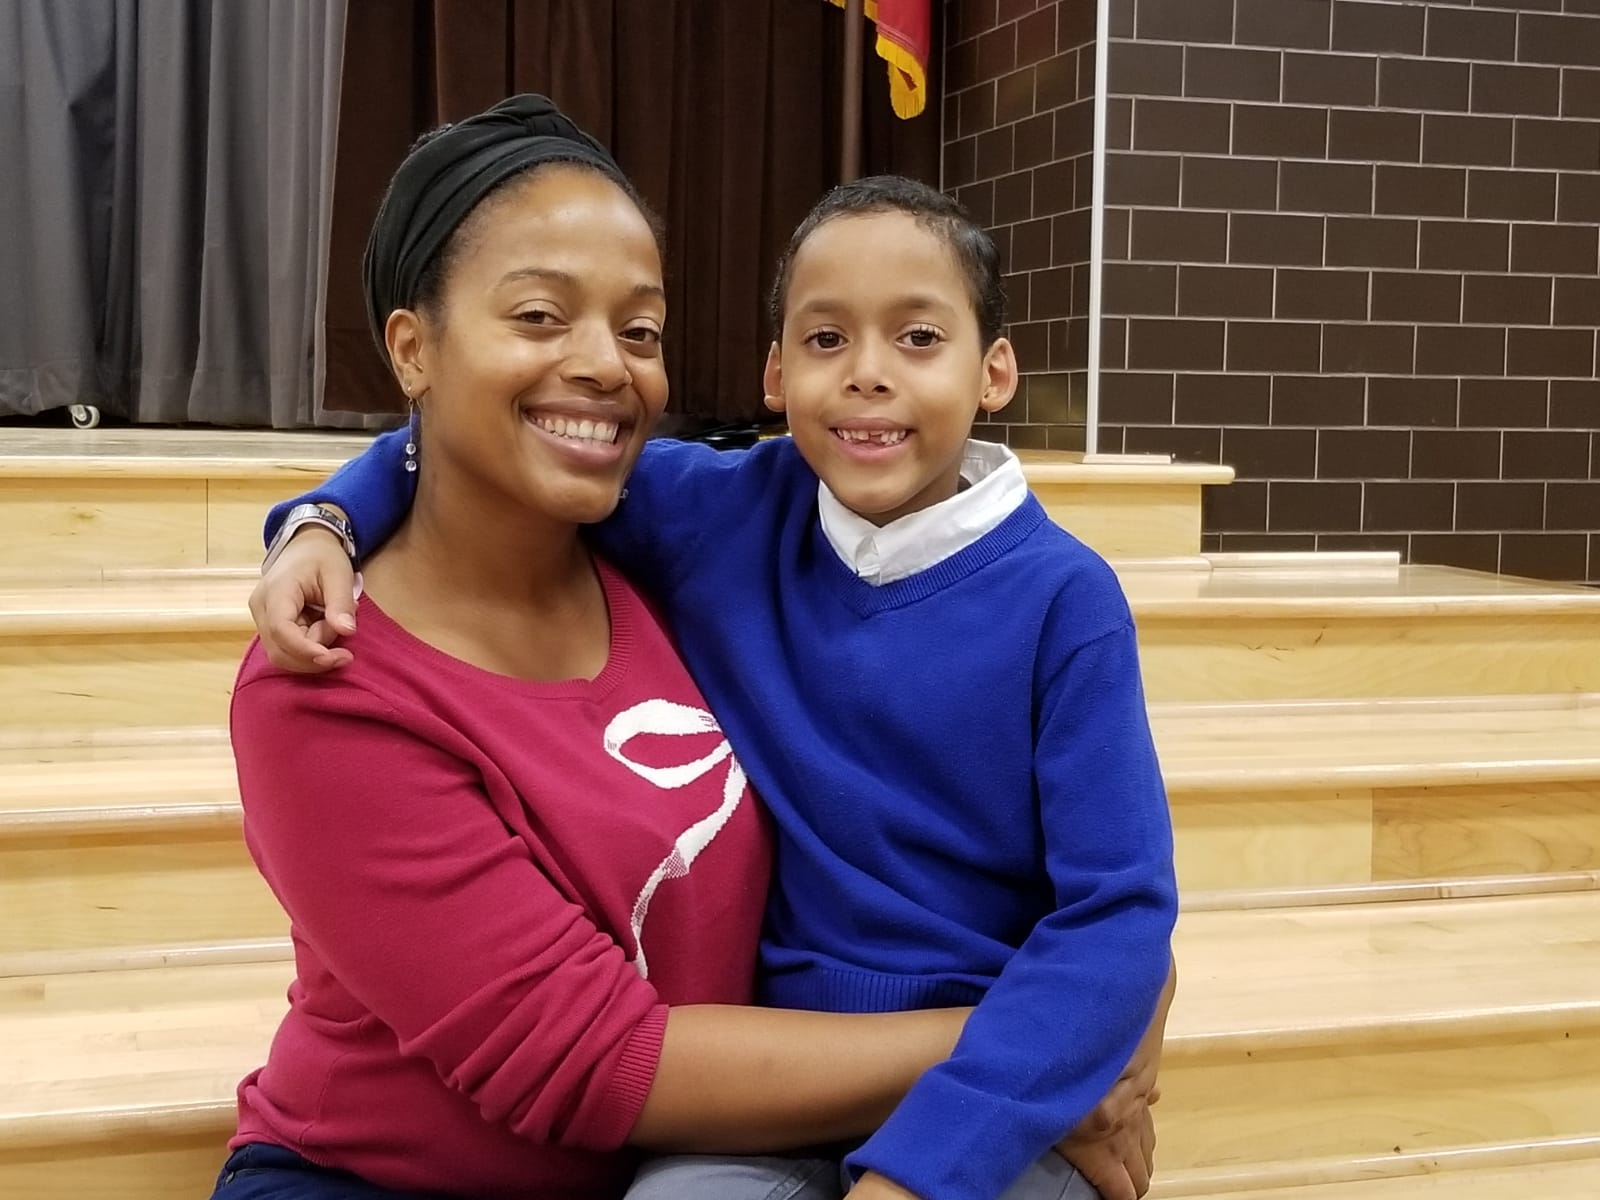 Leolin and son